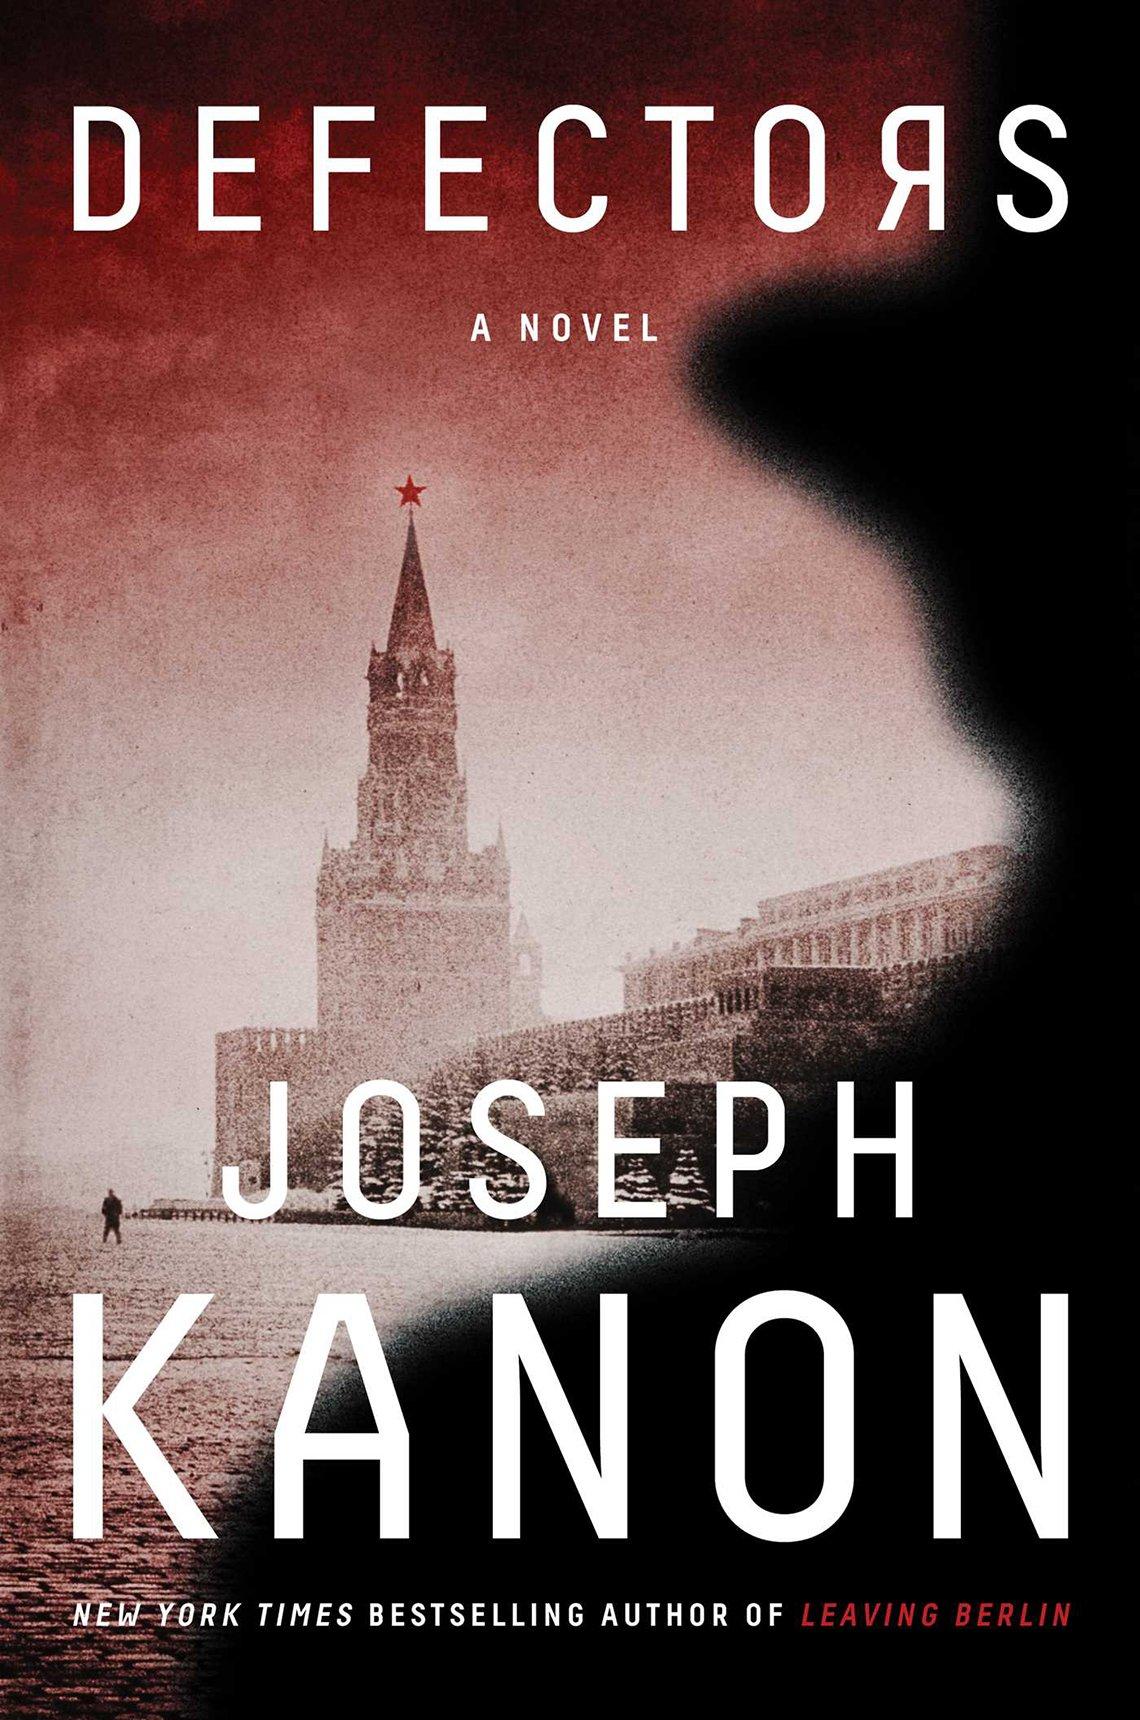 Defectors, by Joseph Kanon